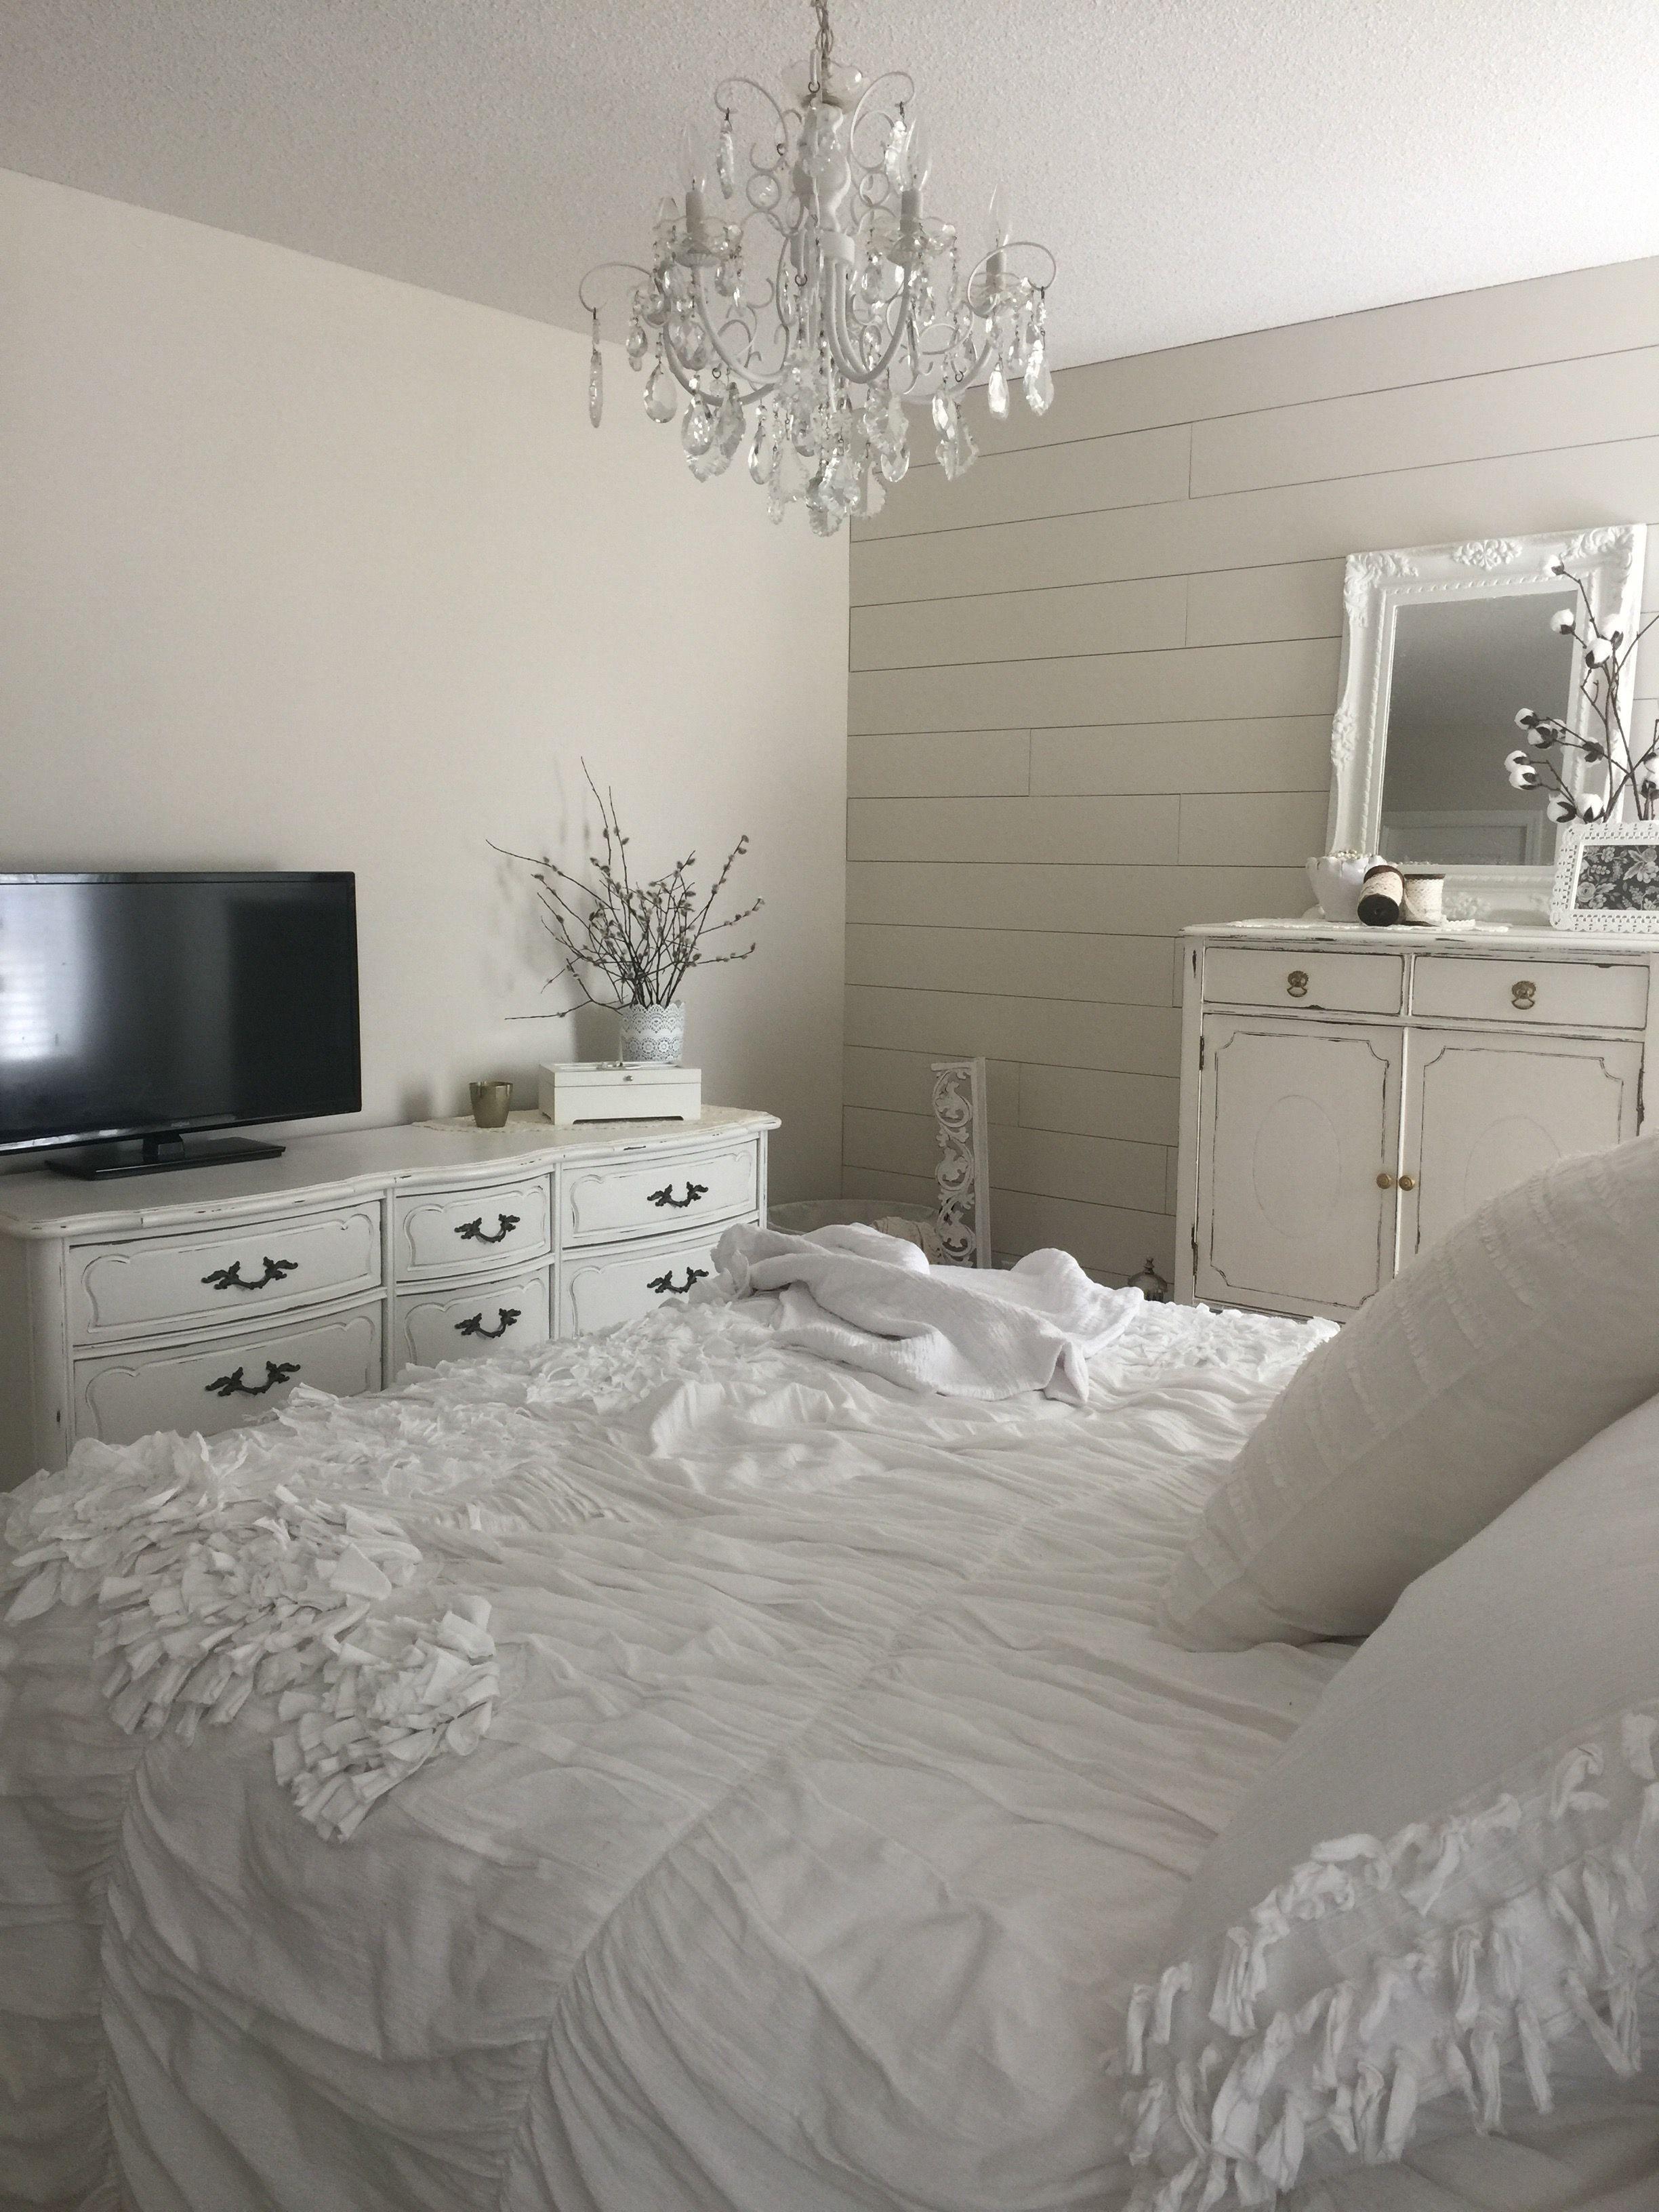 Walls Sherwin Williams Shoji White Dresser And Antique